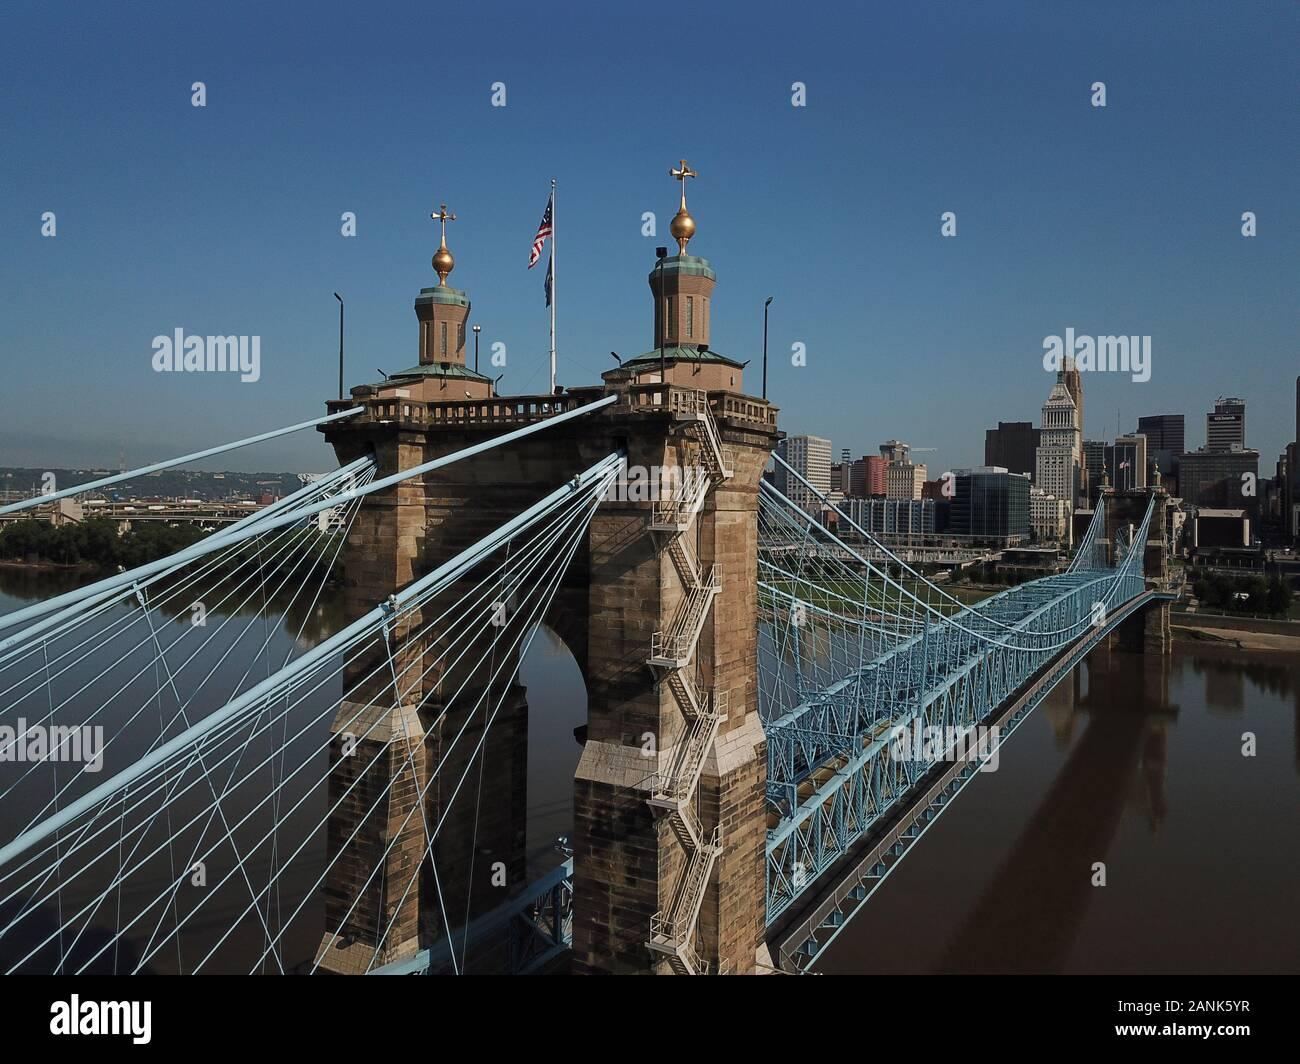 Drone Aerial Roebling suspension bridge over Ohio River downtown Cincinnati USA Stock Photo